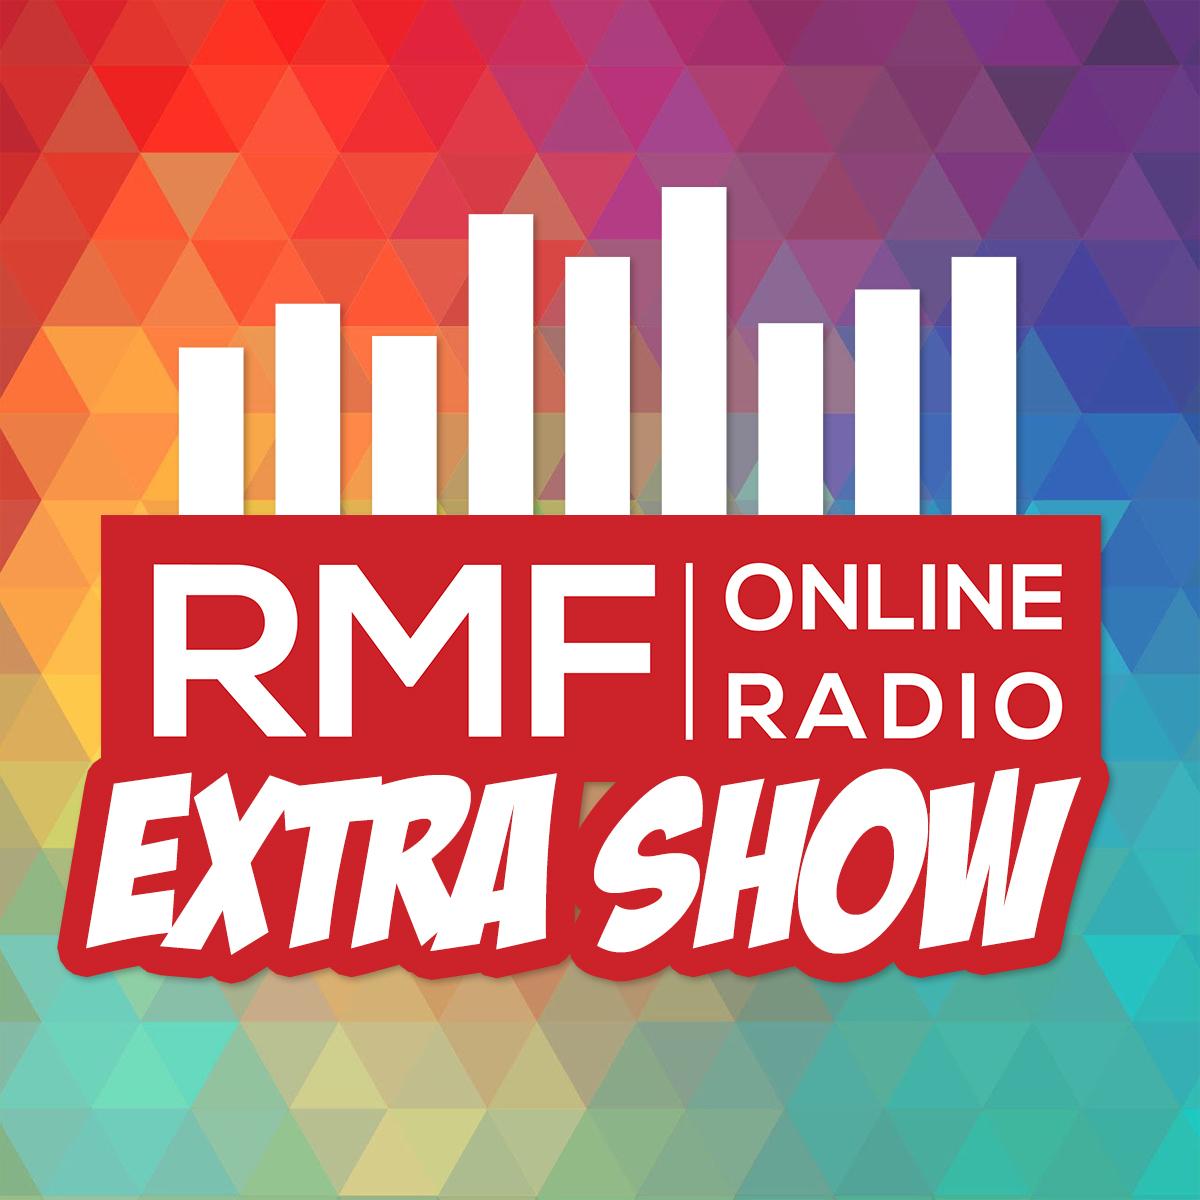 Radio Music Free Extra Show